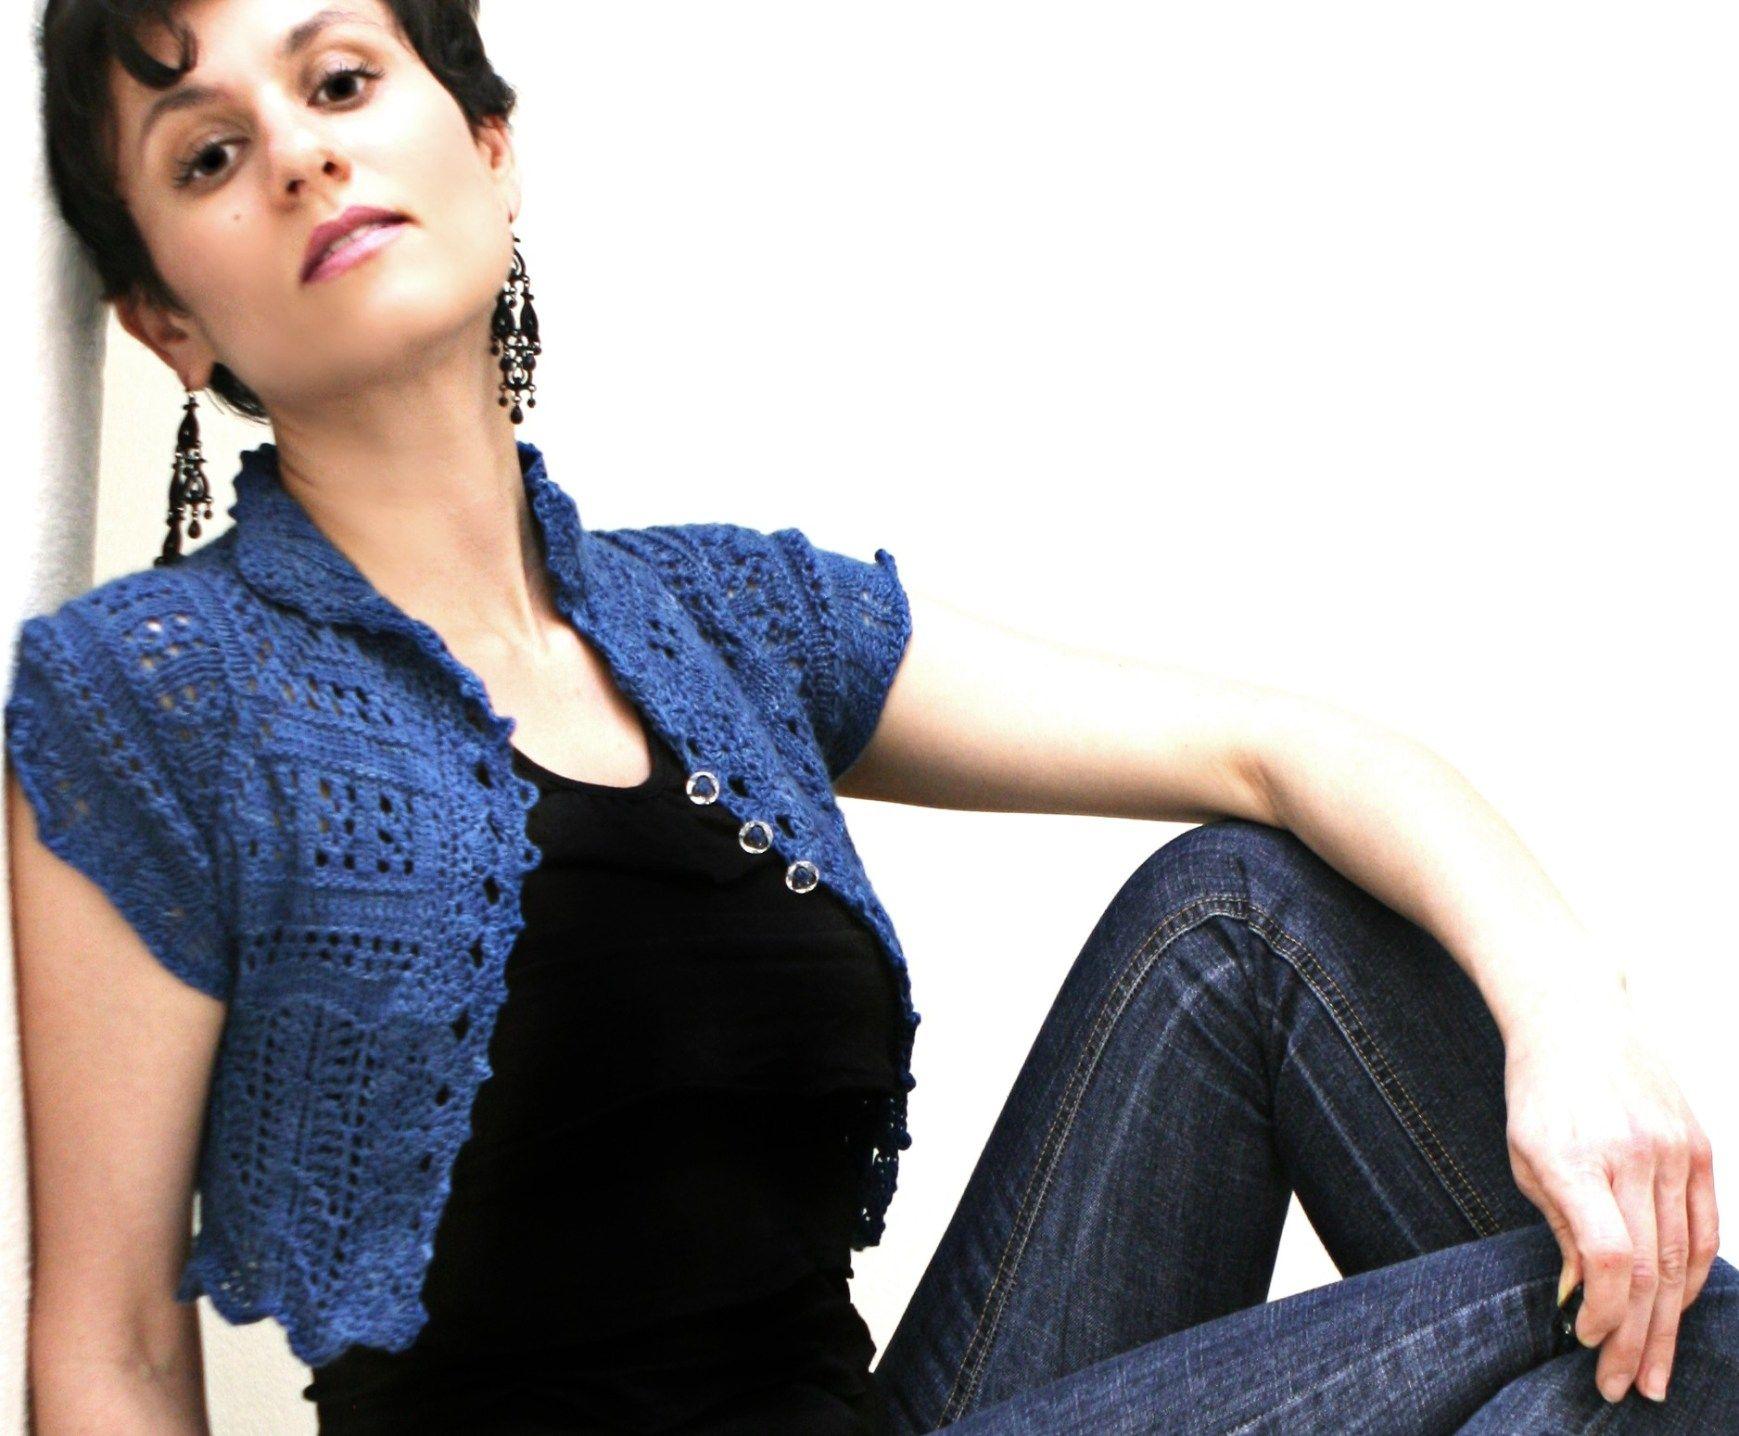 Lace Bolero Crochet Pattern Crazy Lace Cropped Cardi Pattern - vanessaharding.com #irishlacecrochetpattern